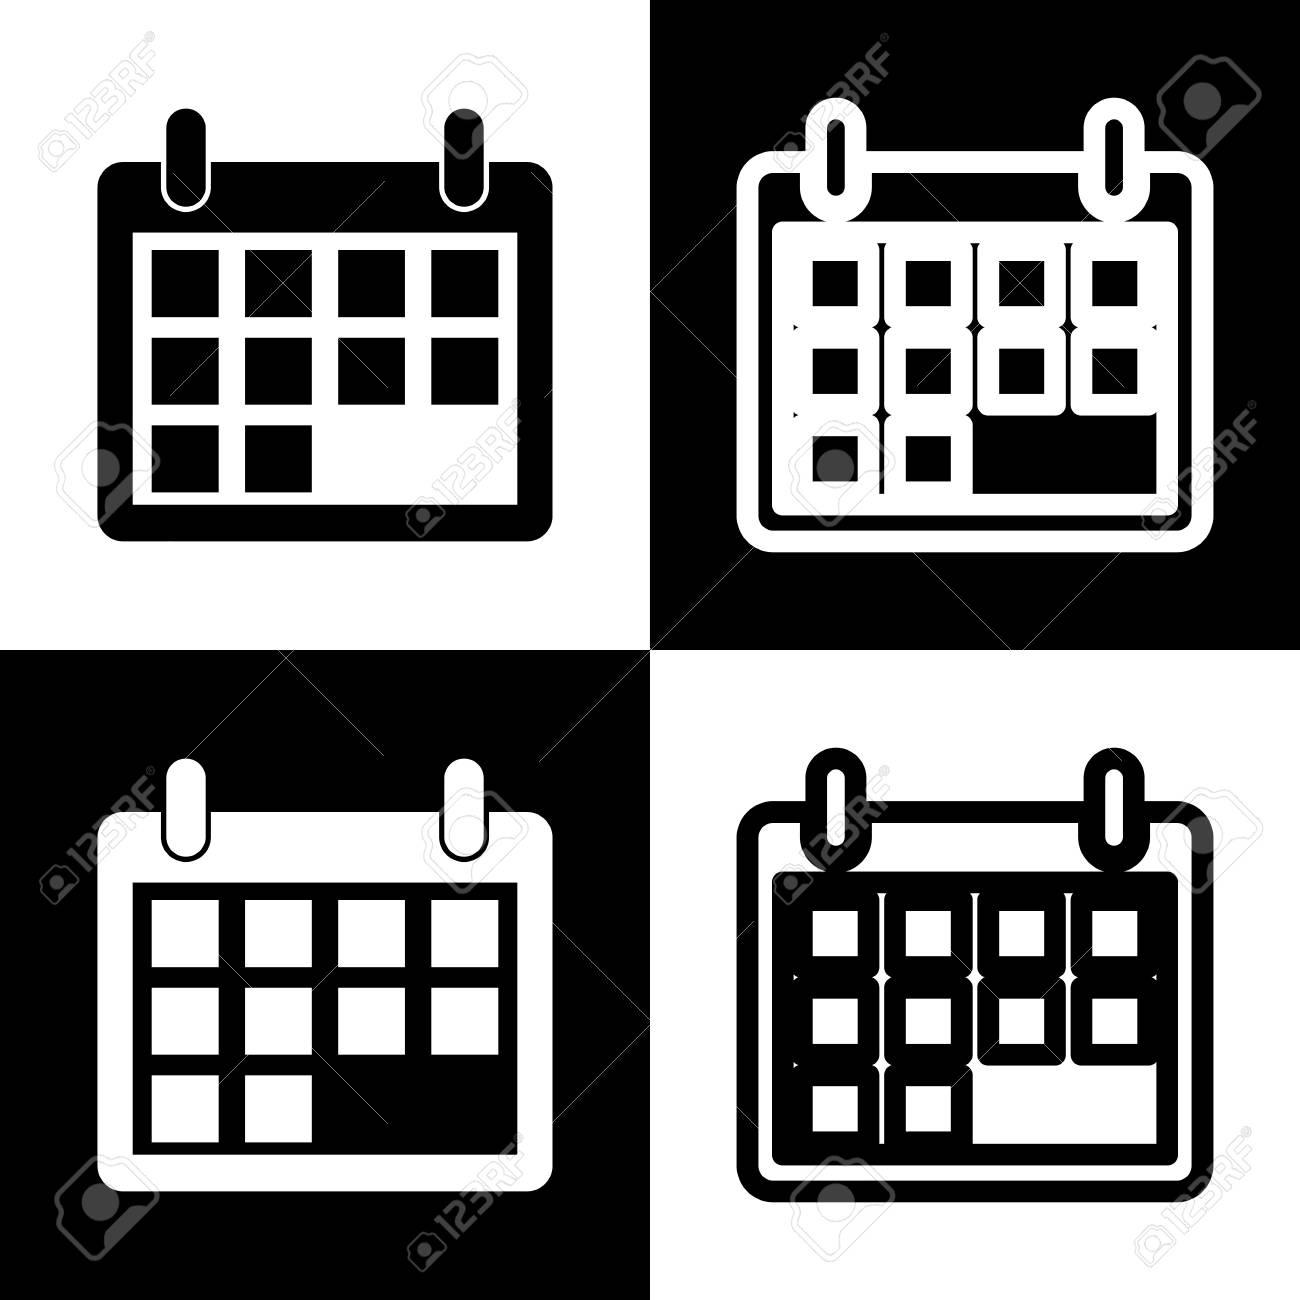 Calendario Vector Blanco.Calendar Sign Illustration Vector Black And White Icons And